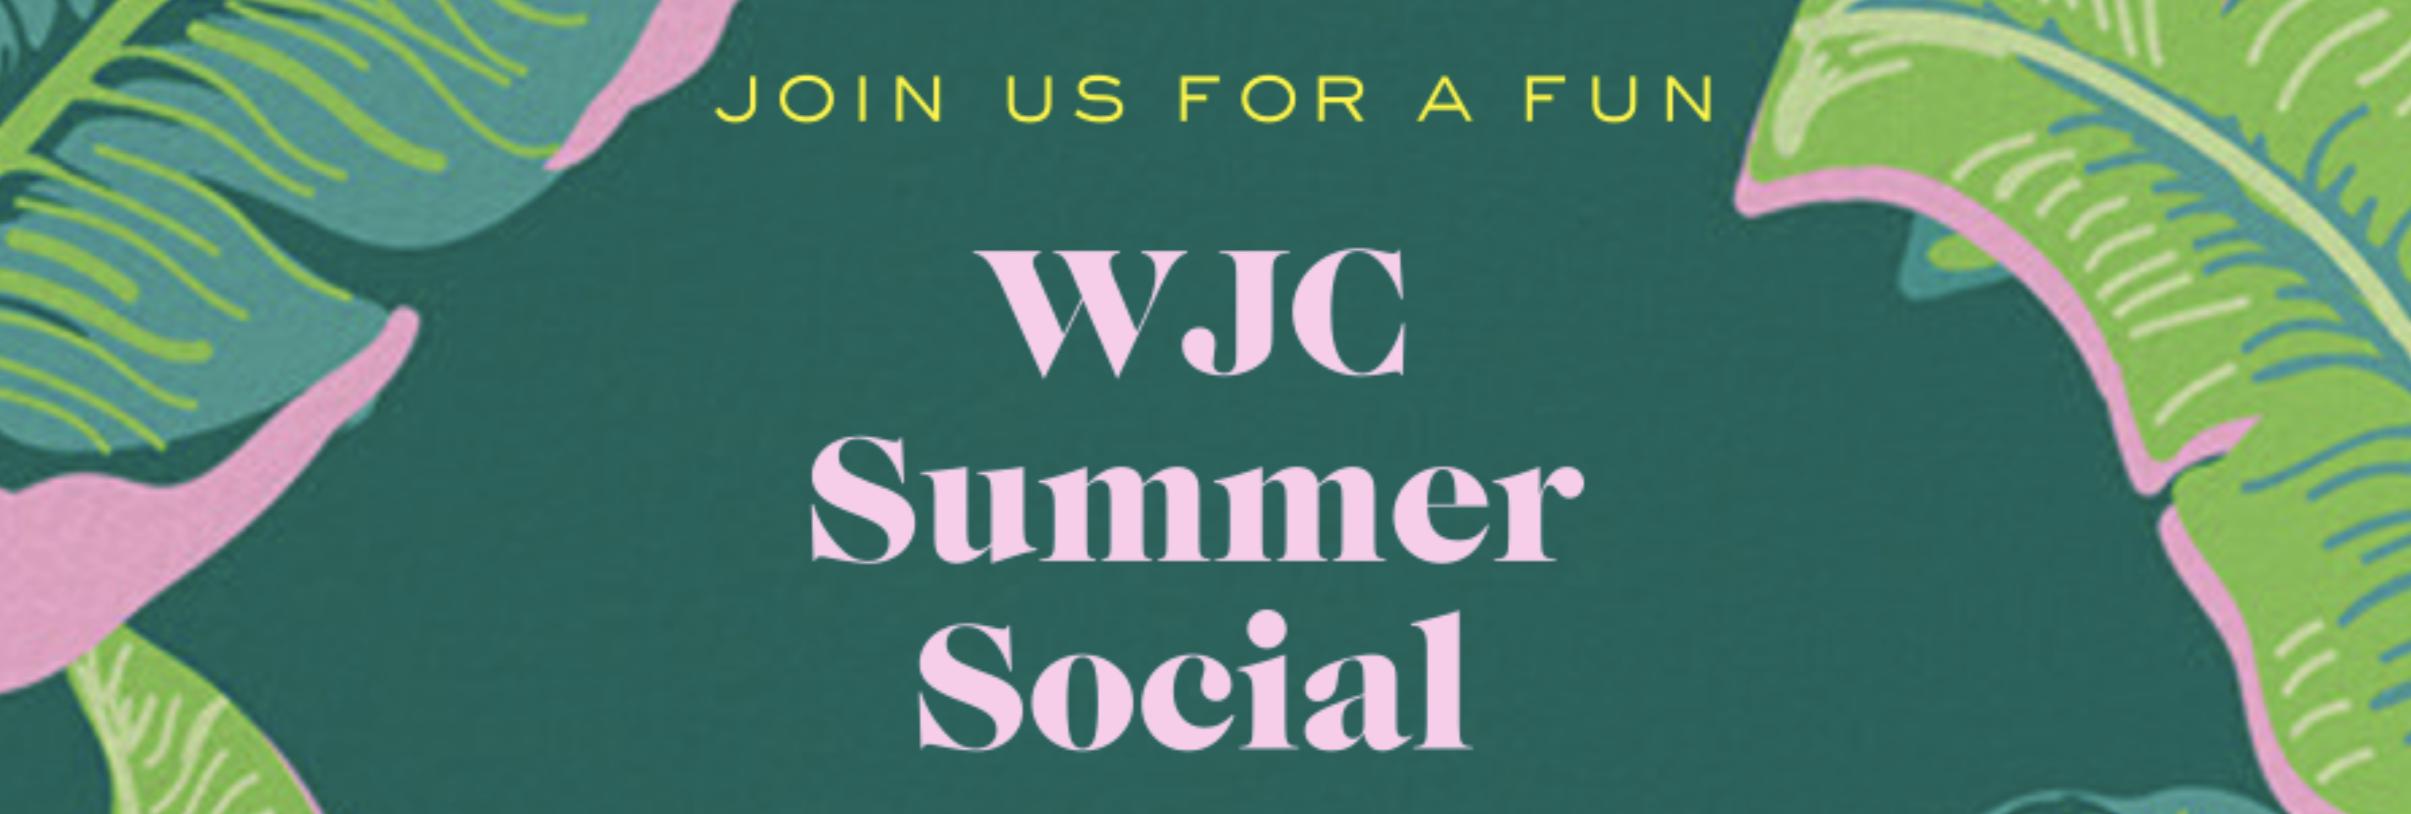 "<a href=""https://www.woodburyjc.org/summer-social-2021#""                                     target=""_blank"">                                                                 <span class=""slider_title"">                                     WJC Summer Social!                                </span>                                                                 </a>                                                                                                                                                                                       <span class=""slider_description"">For Members and Preschool Families</span>"